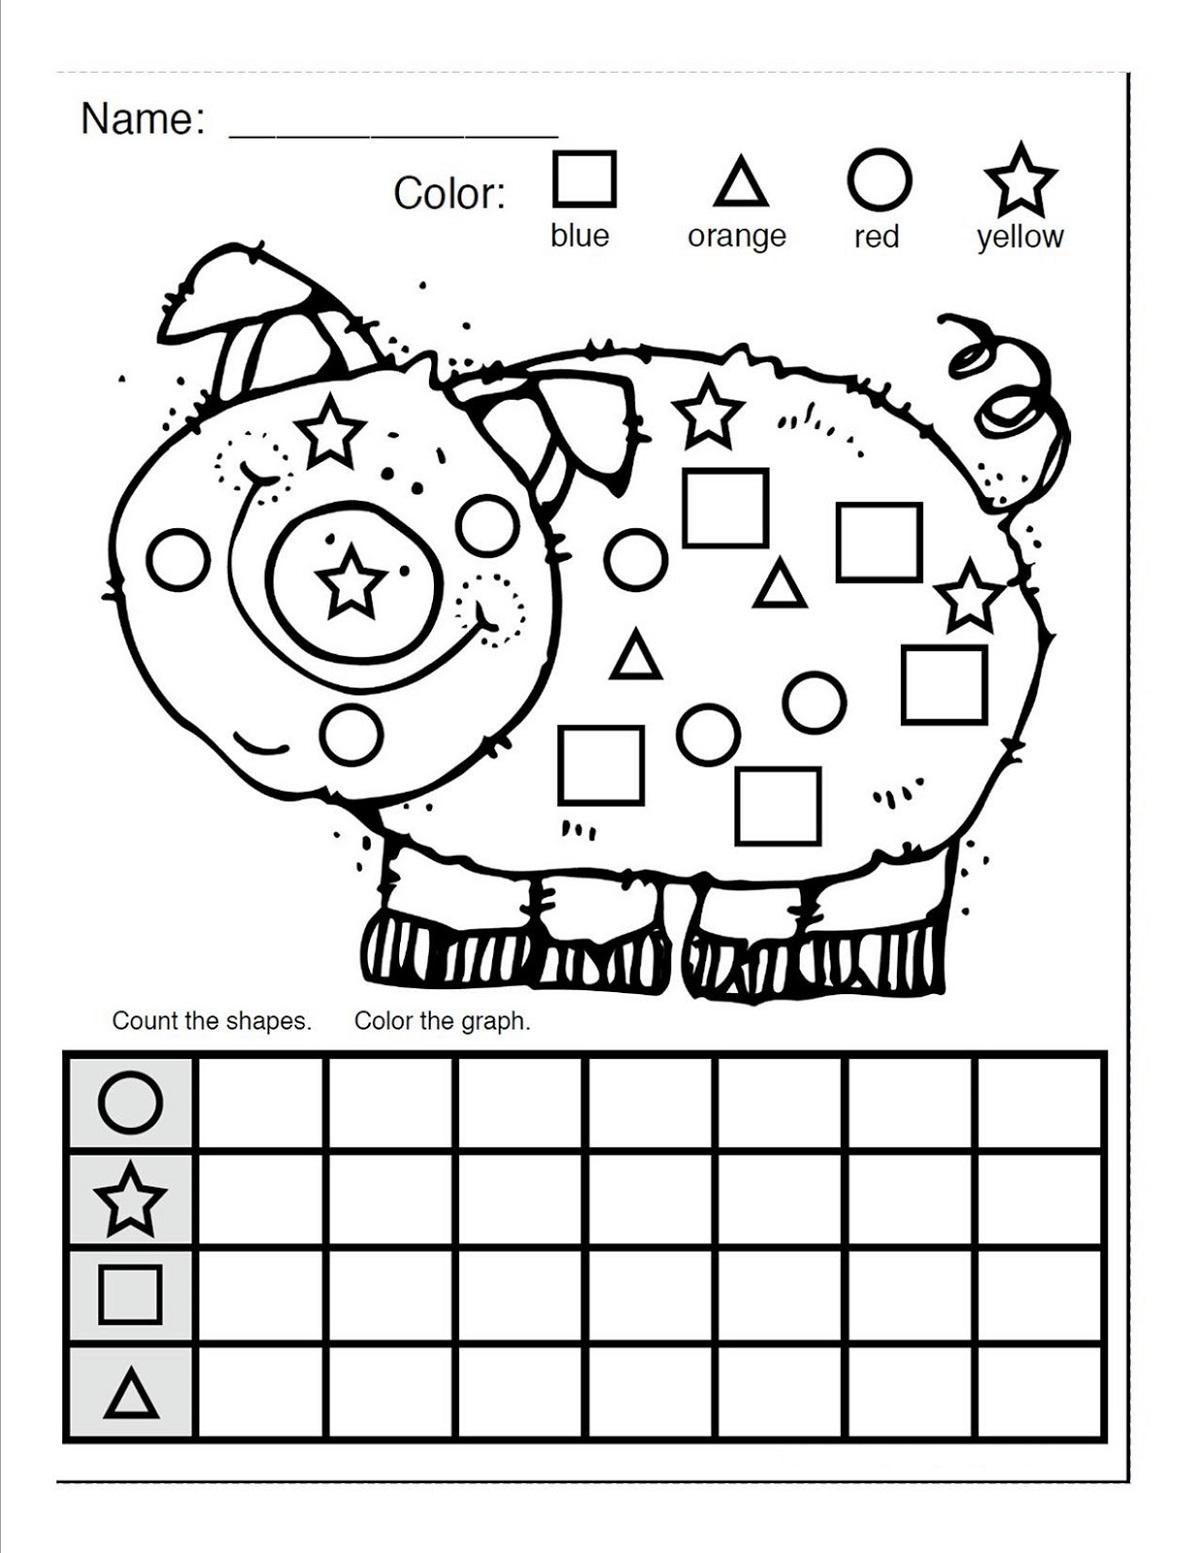 Color By Shape Worksheet Easy